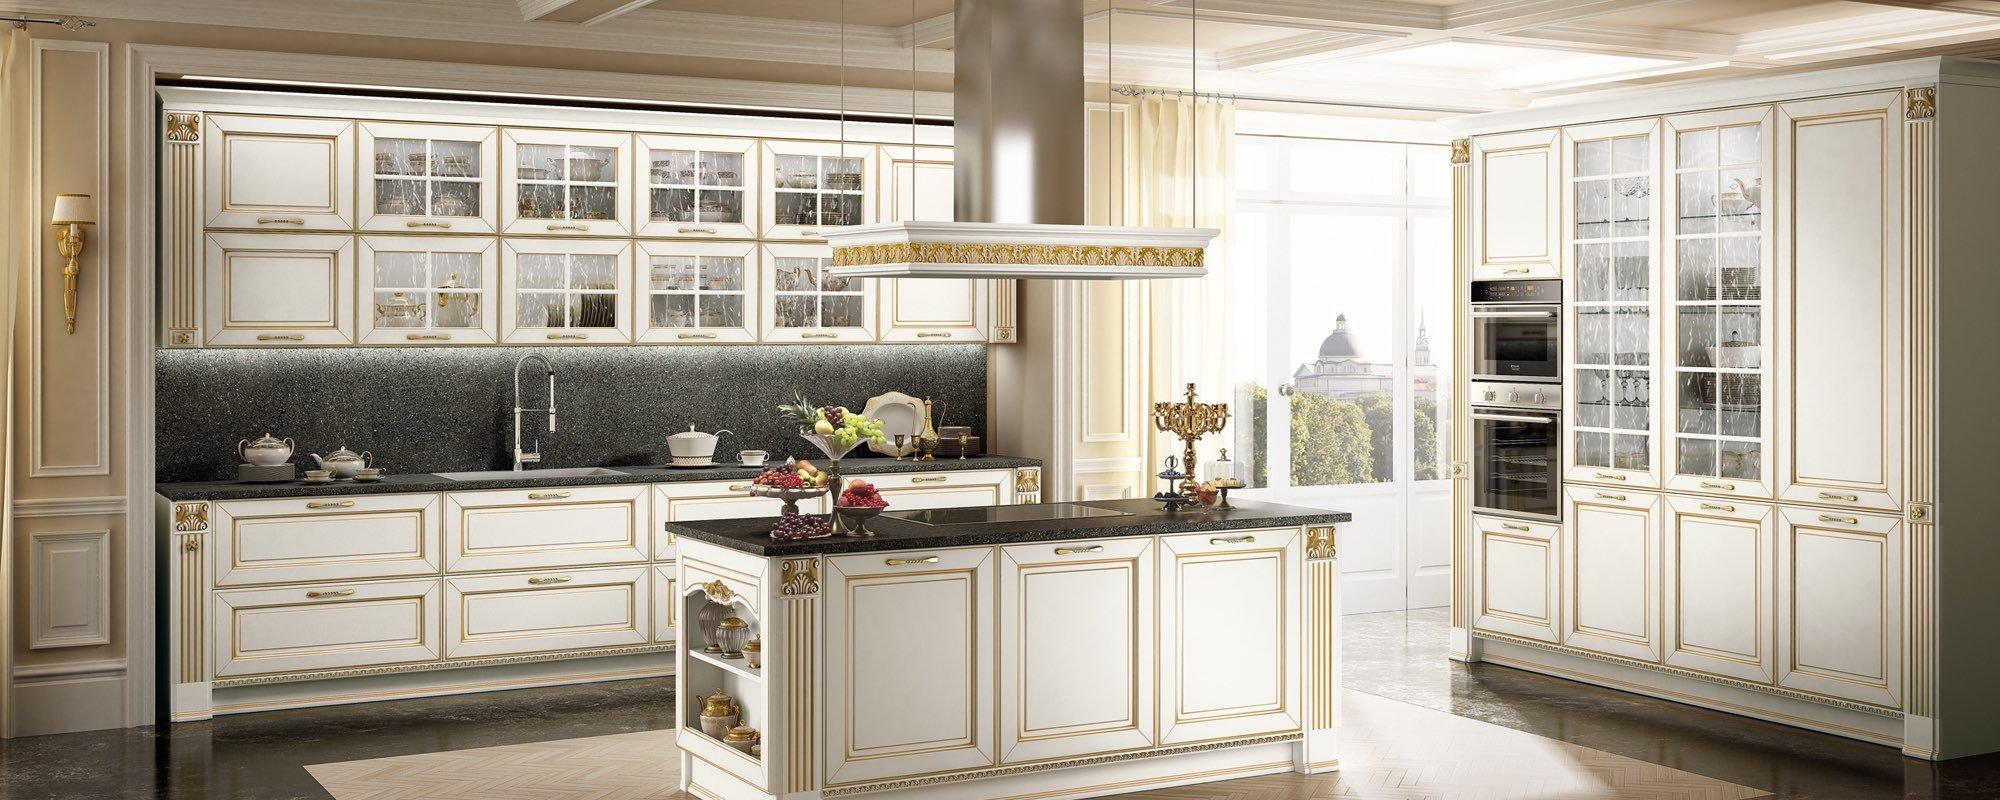 Cucina Stosa-Dolcevita